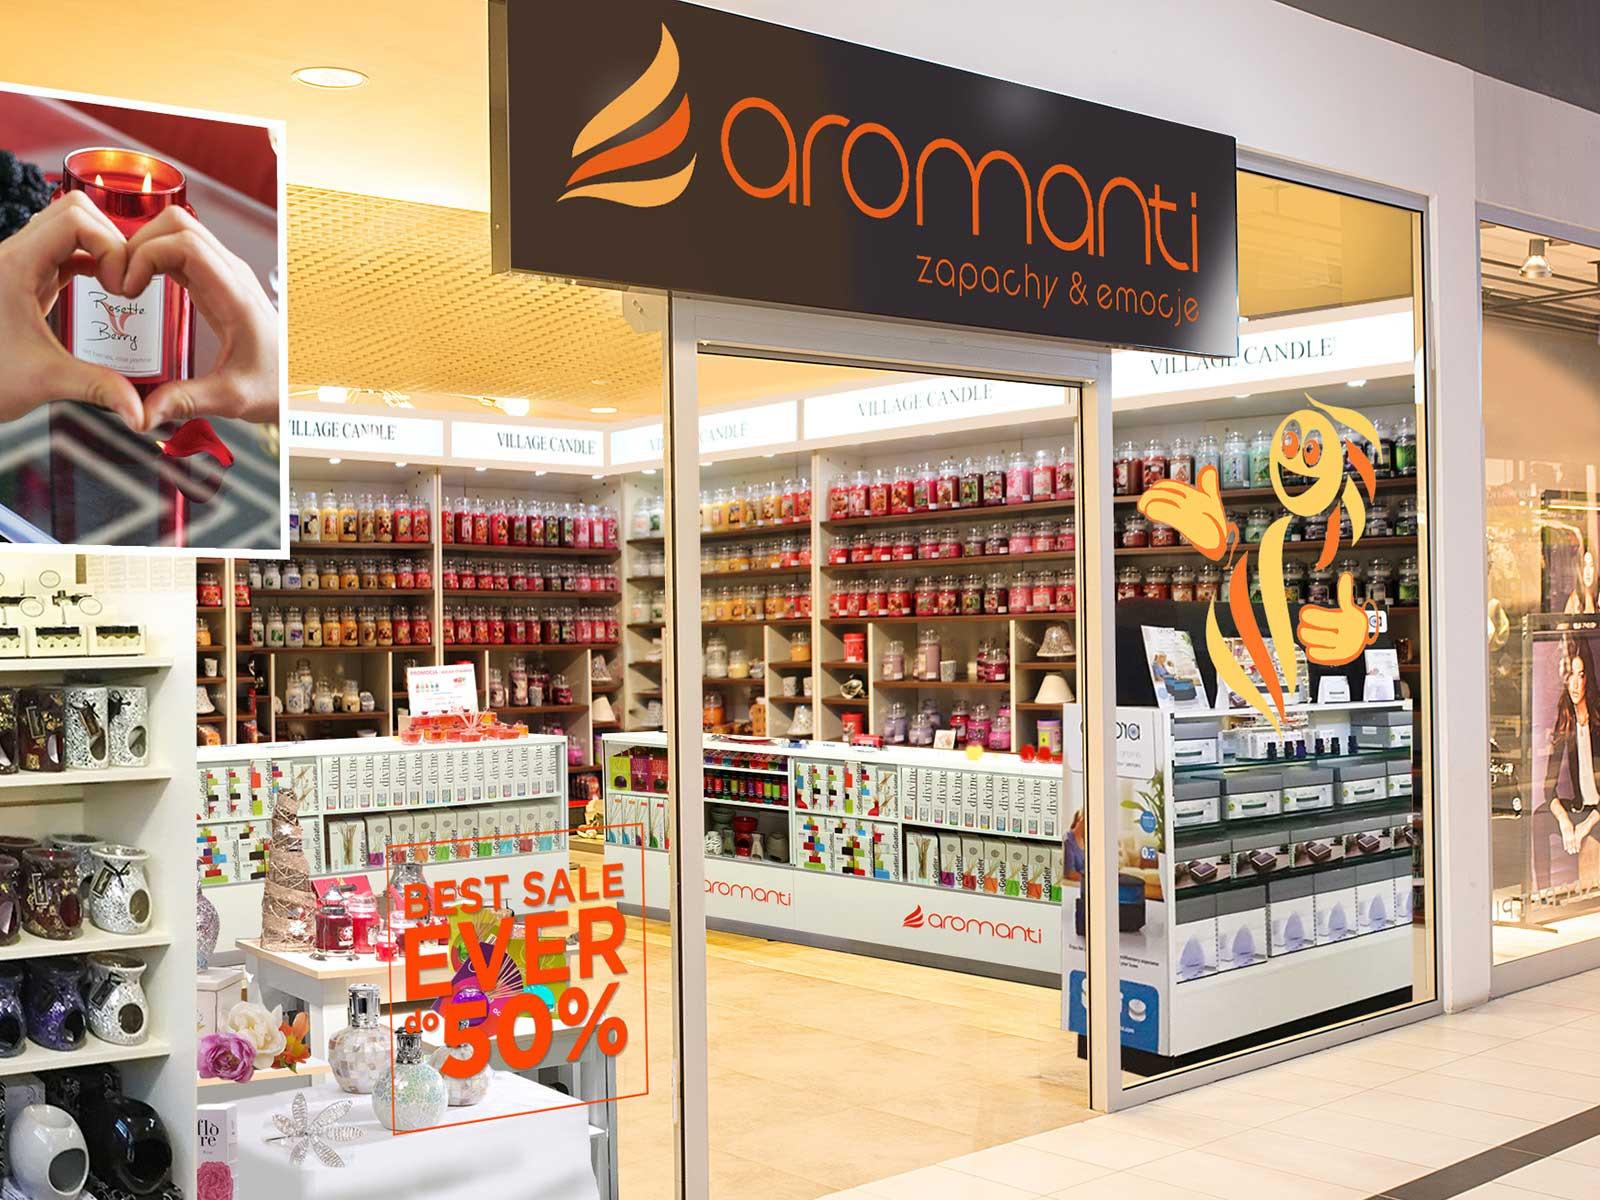 Jedyny sklep Aromanti